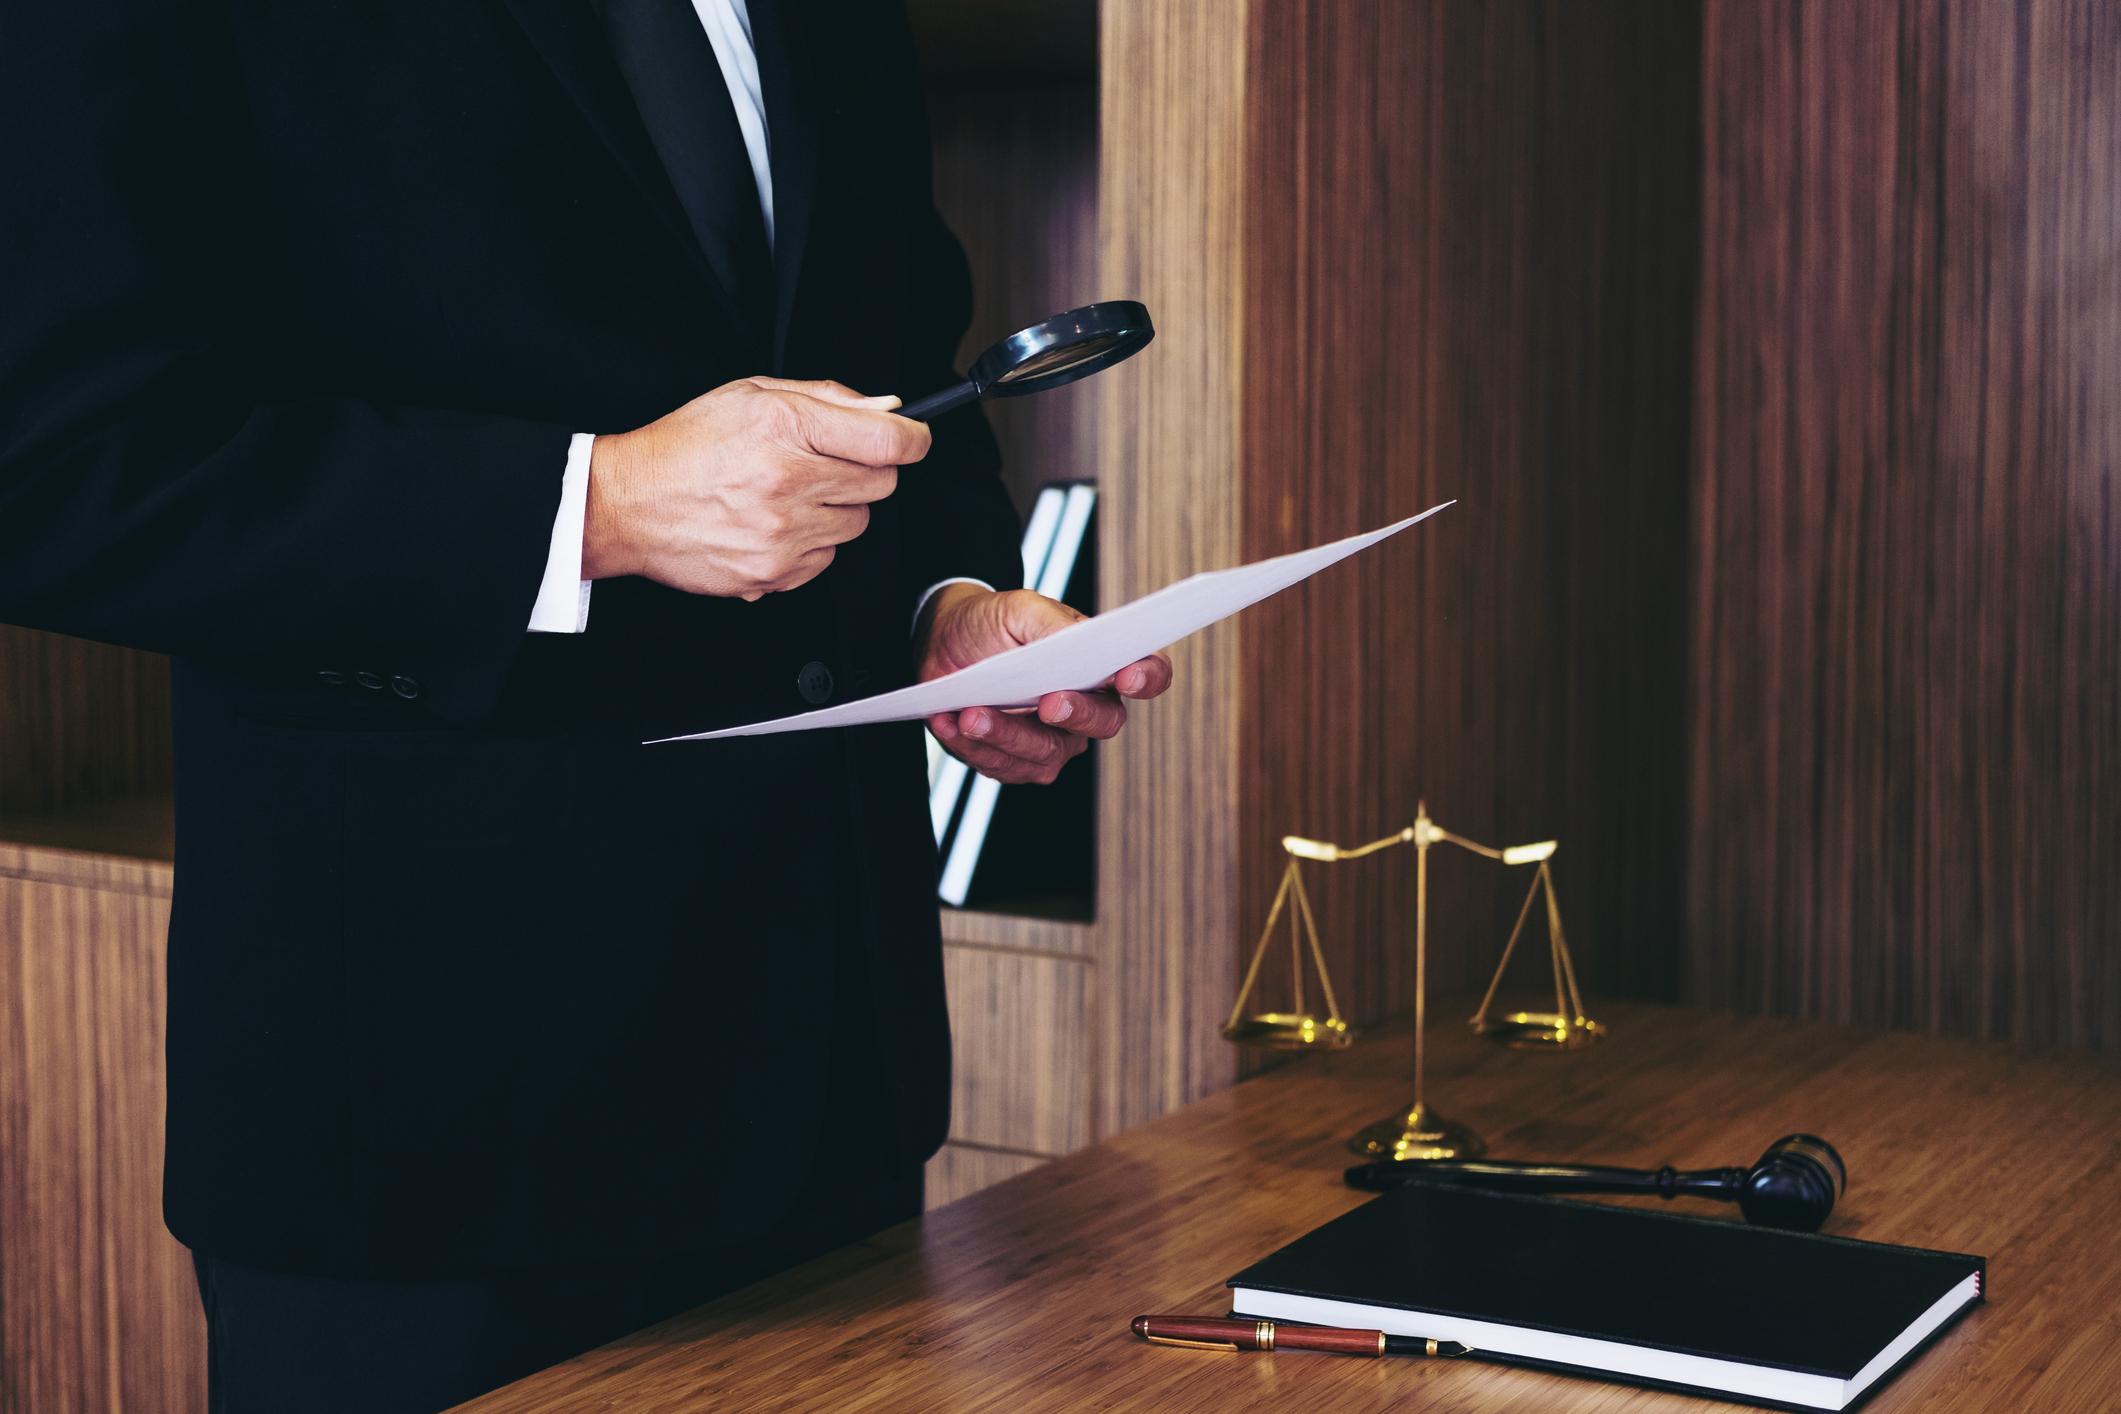 Shareholders Launch Class-Action Lawsuit Against Schorsch